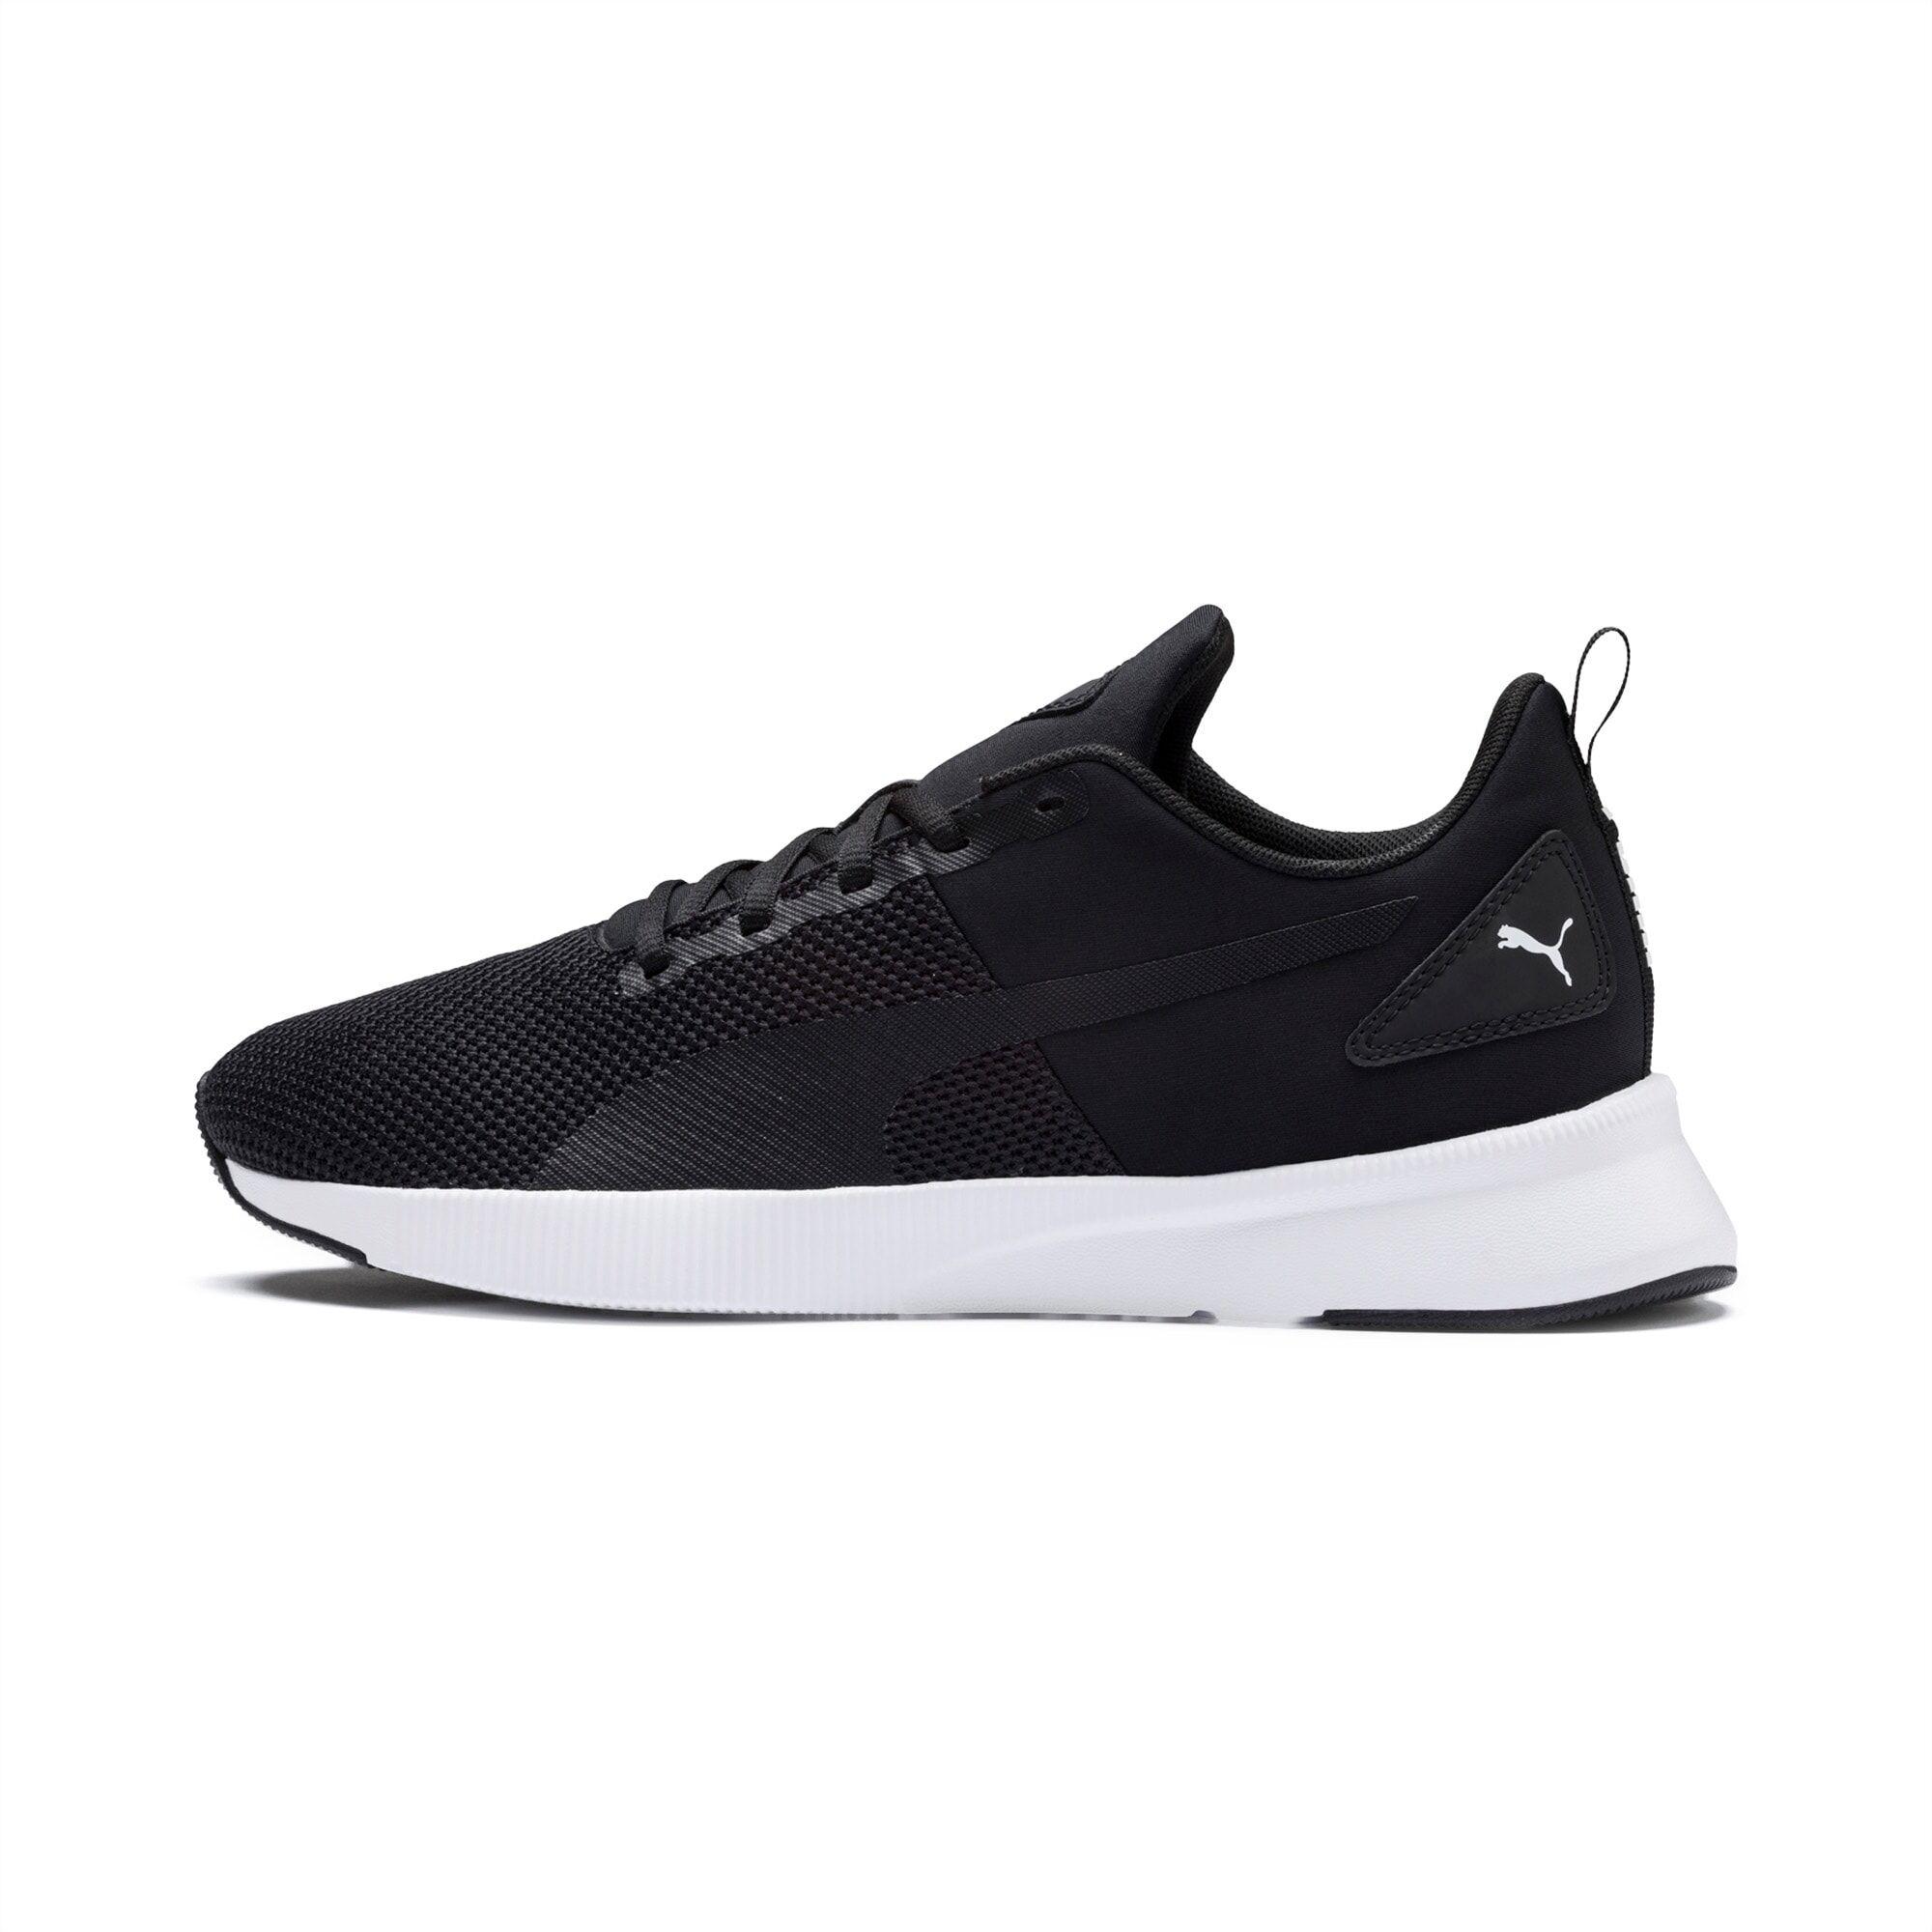 PUMA Chaussure de course Flyer Runner, Noir/Blanc, Taille 42.5, Chaussures